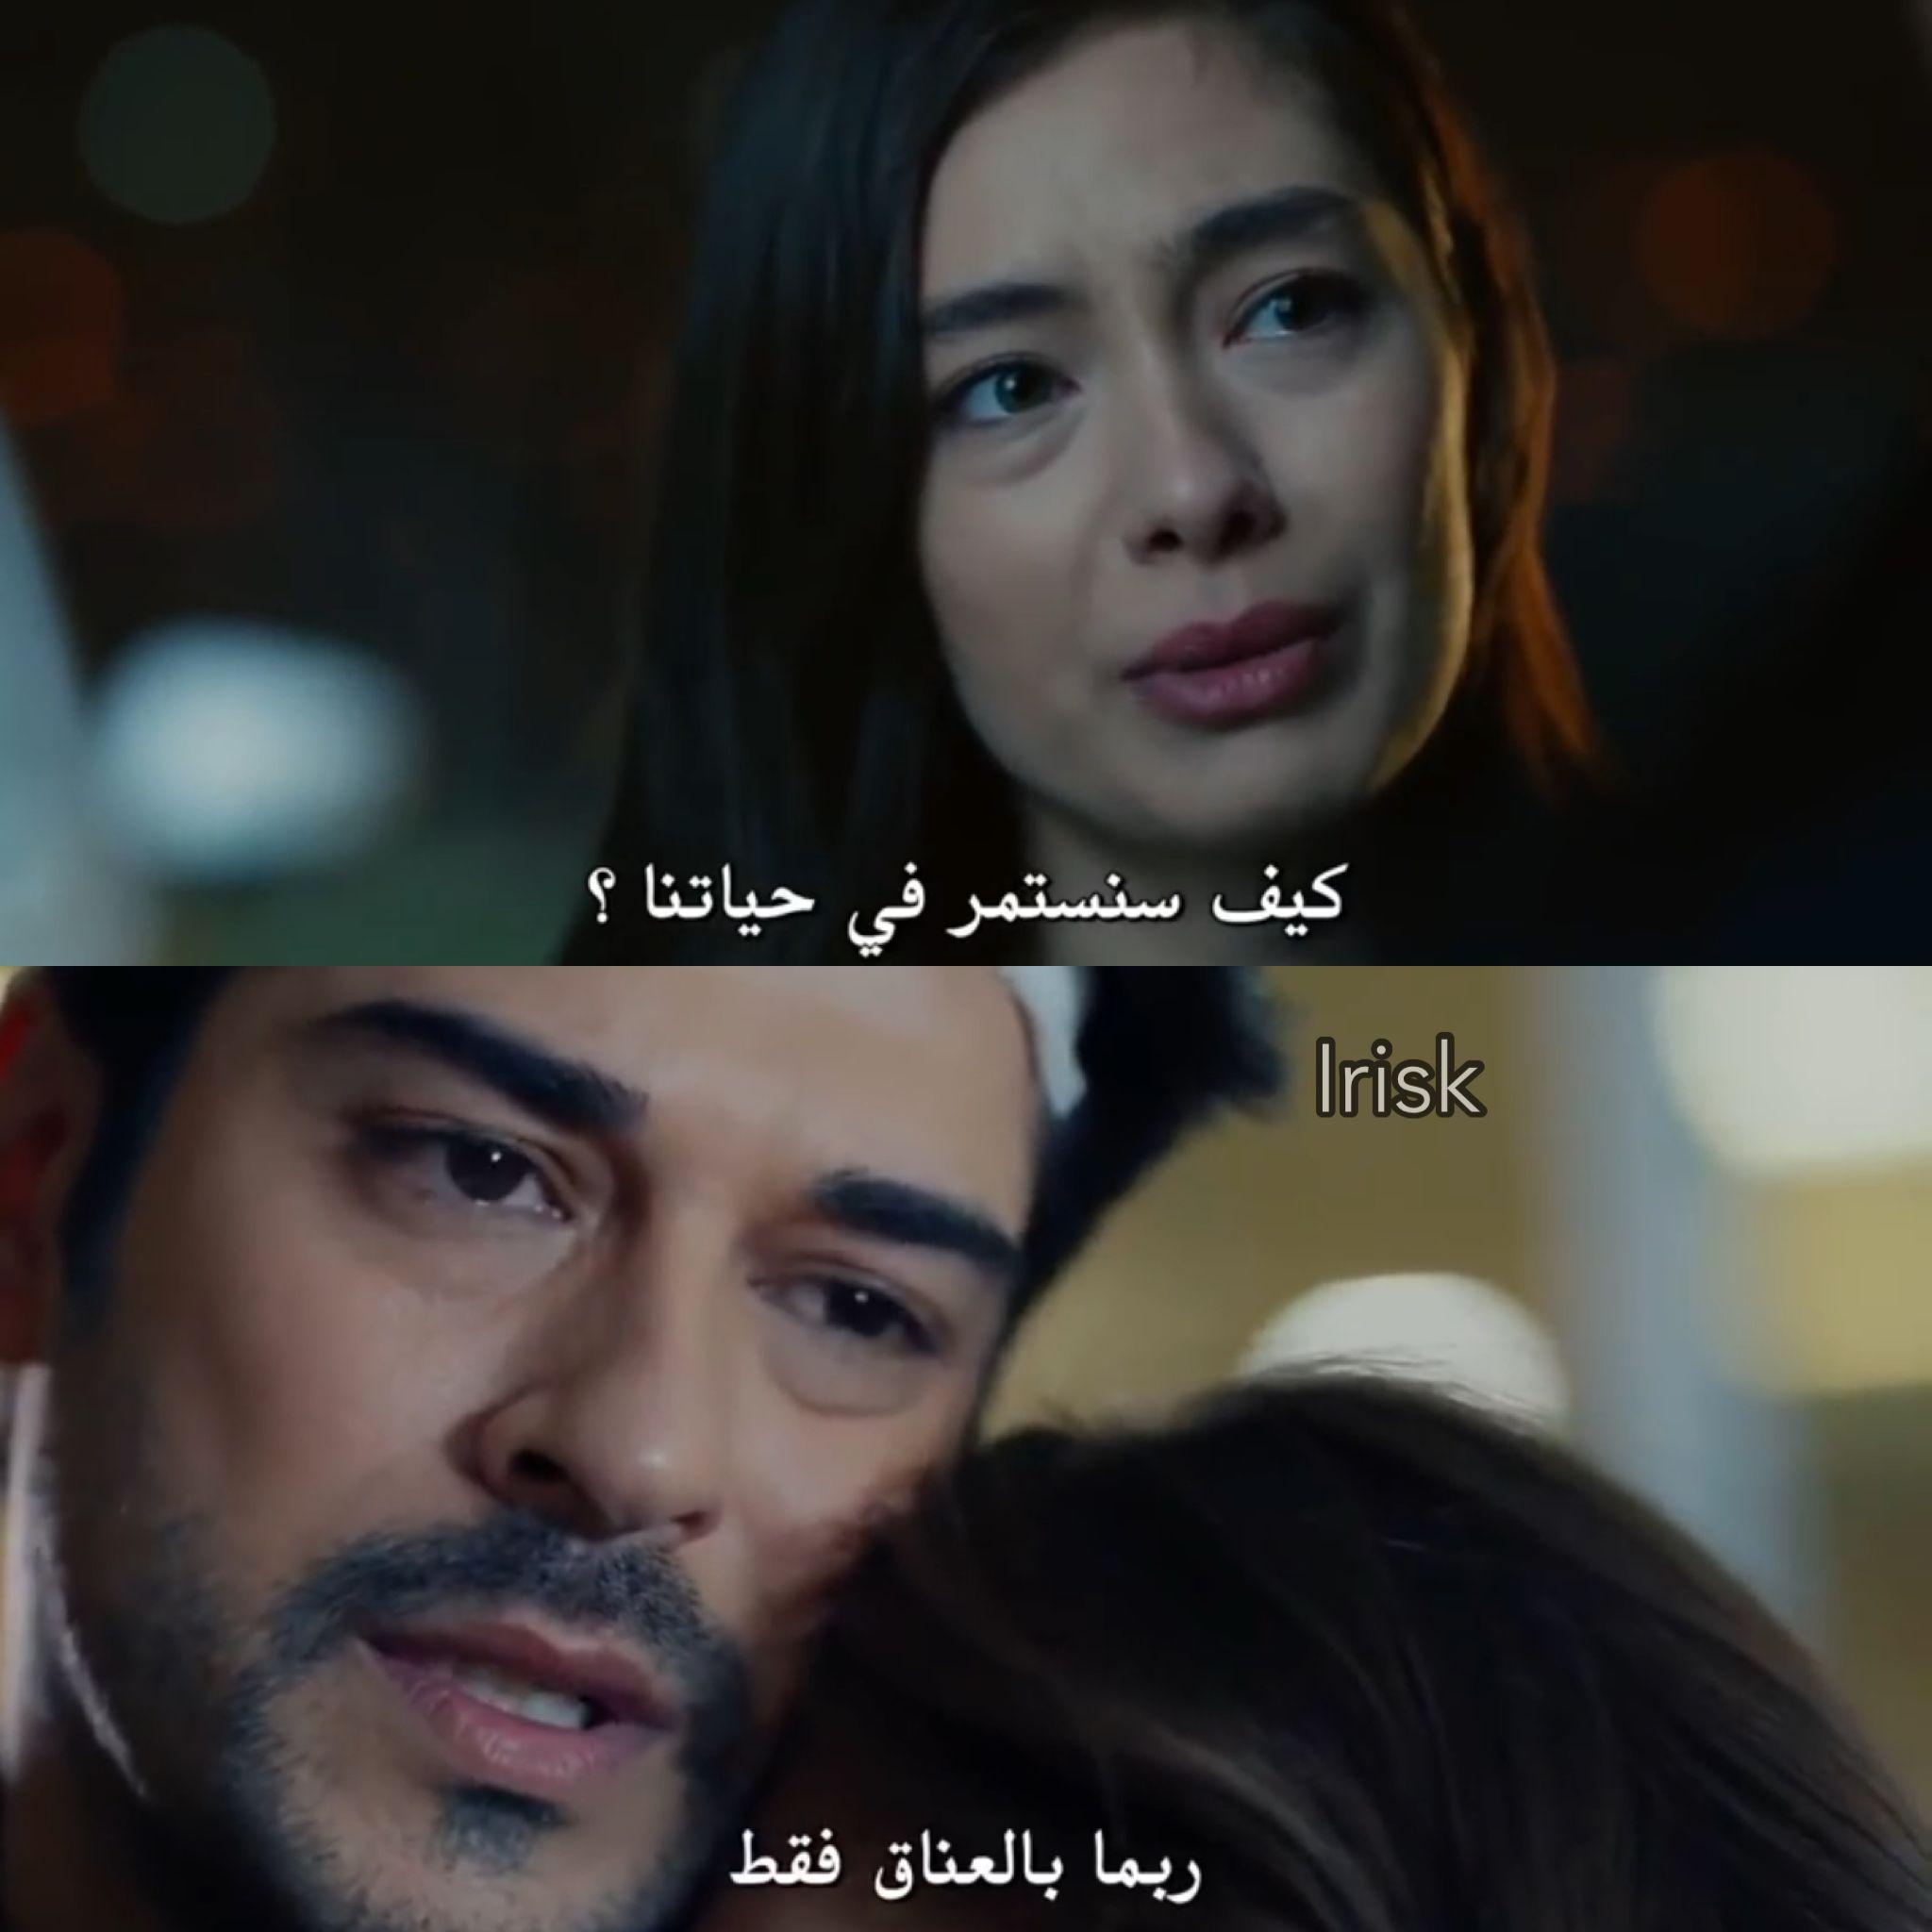 Kara Sevda حب اعمى Quotes Love Quotes Arabic Quotes